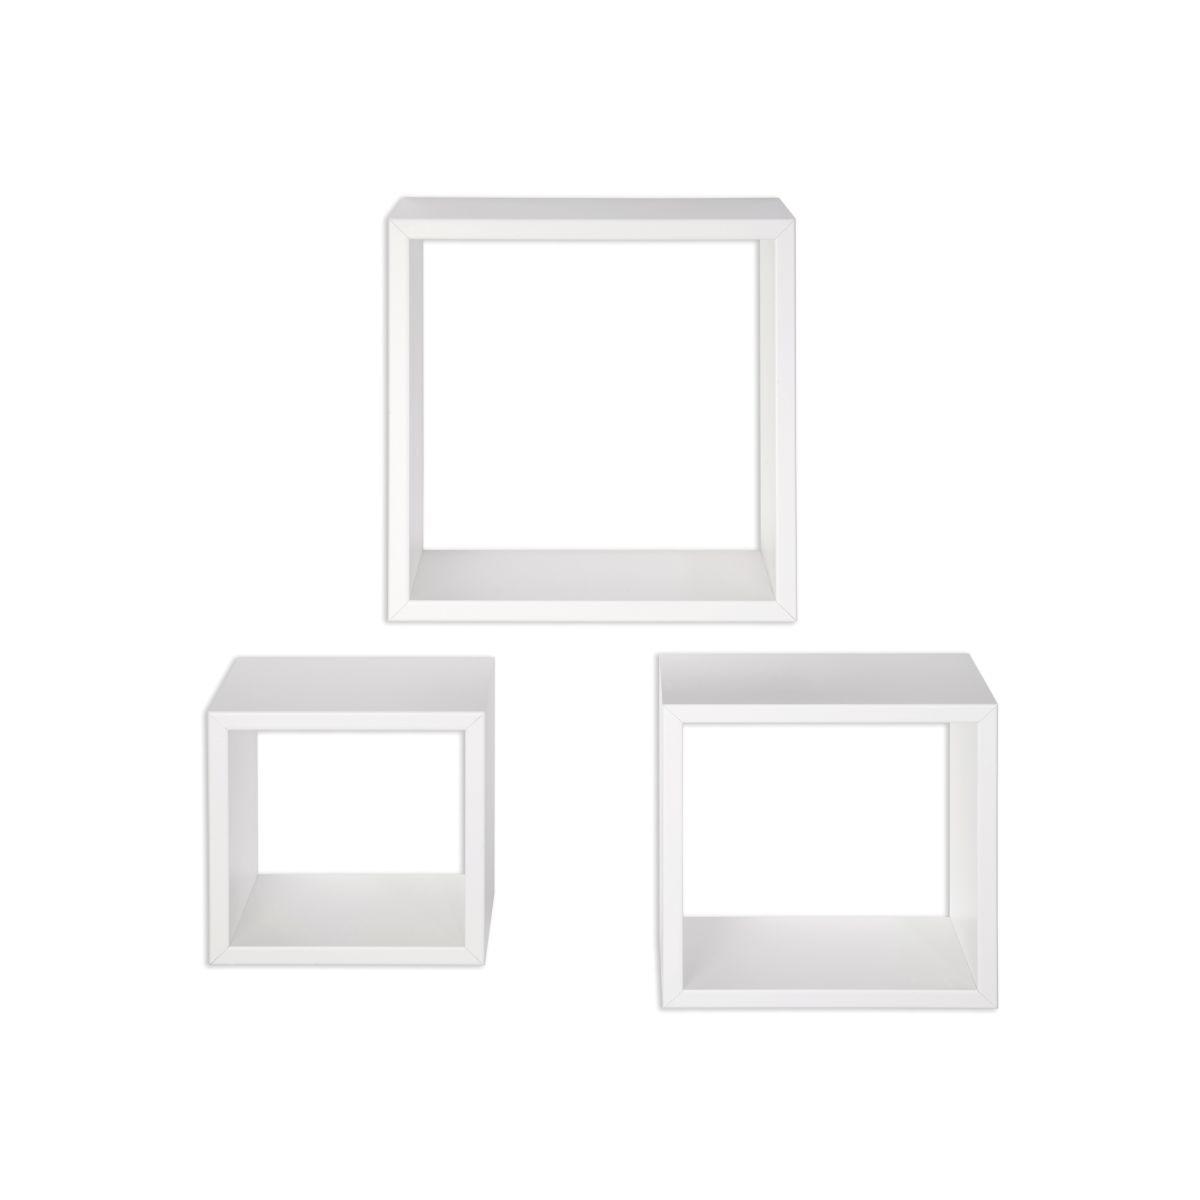 Kit 3 Mensole Bea Bianco 35 X 15,5 Cm: Prezzi E Offerte Online